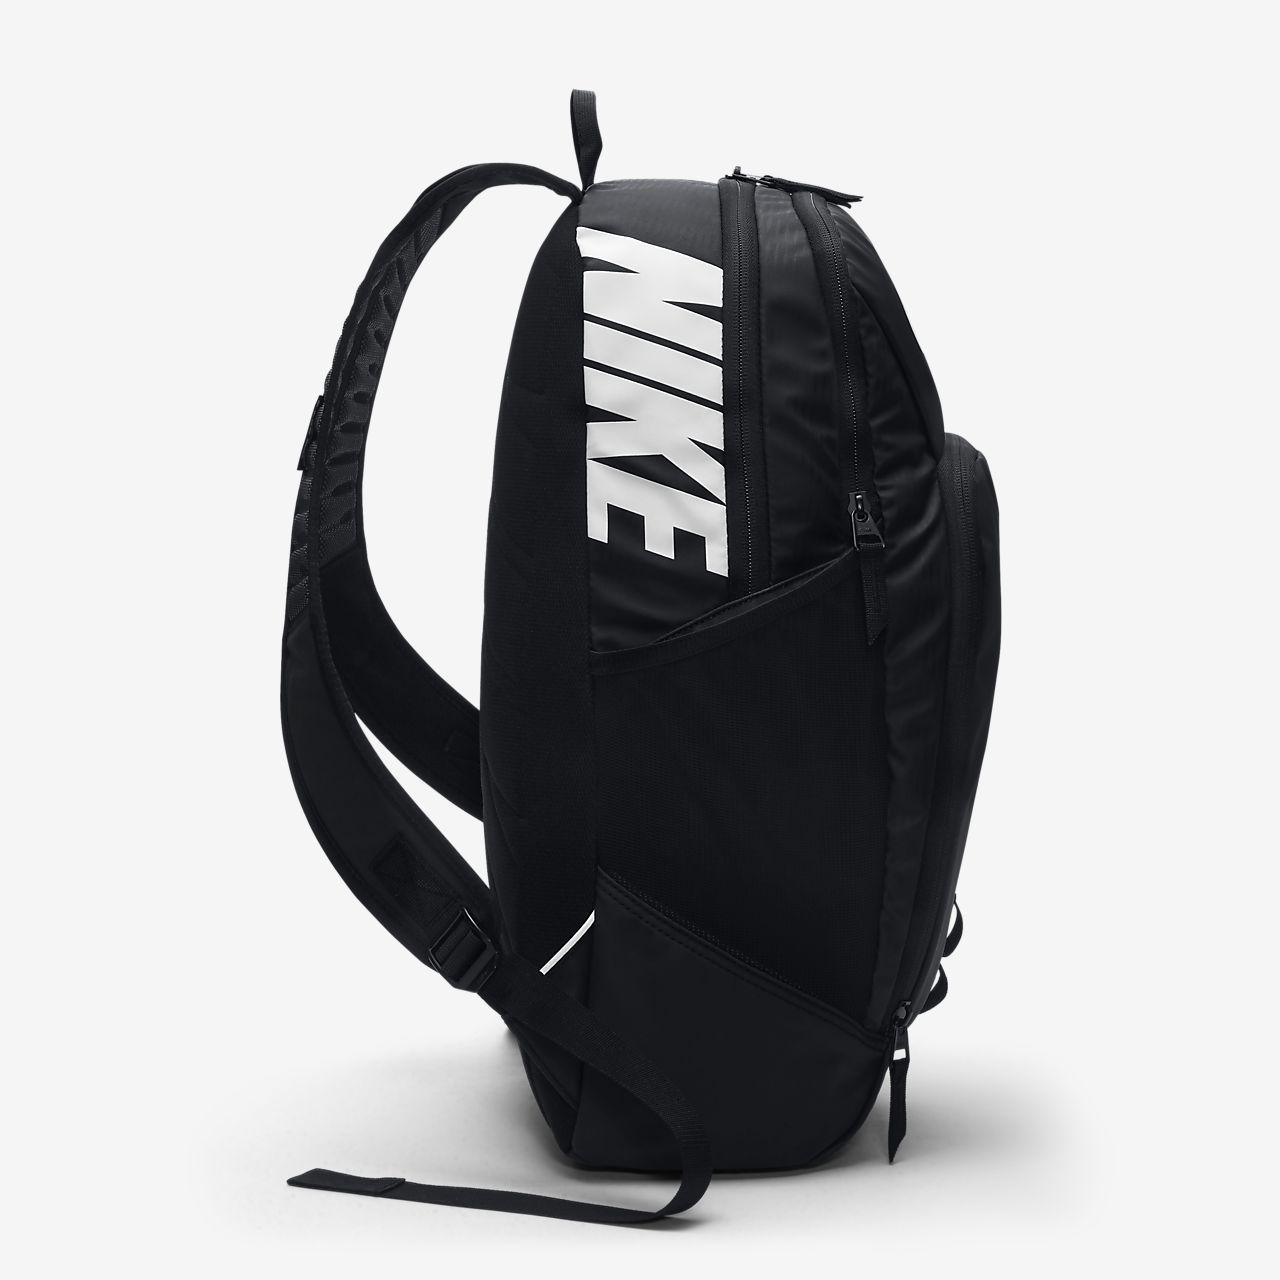 Athdpt nike рюкзак поставщики рюкзаков